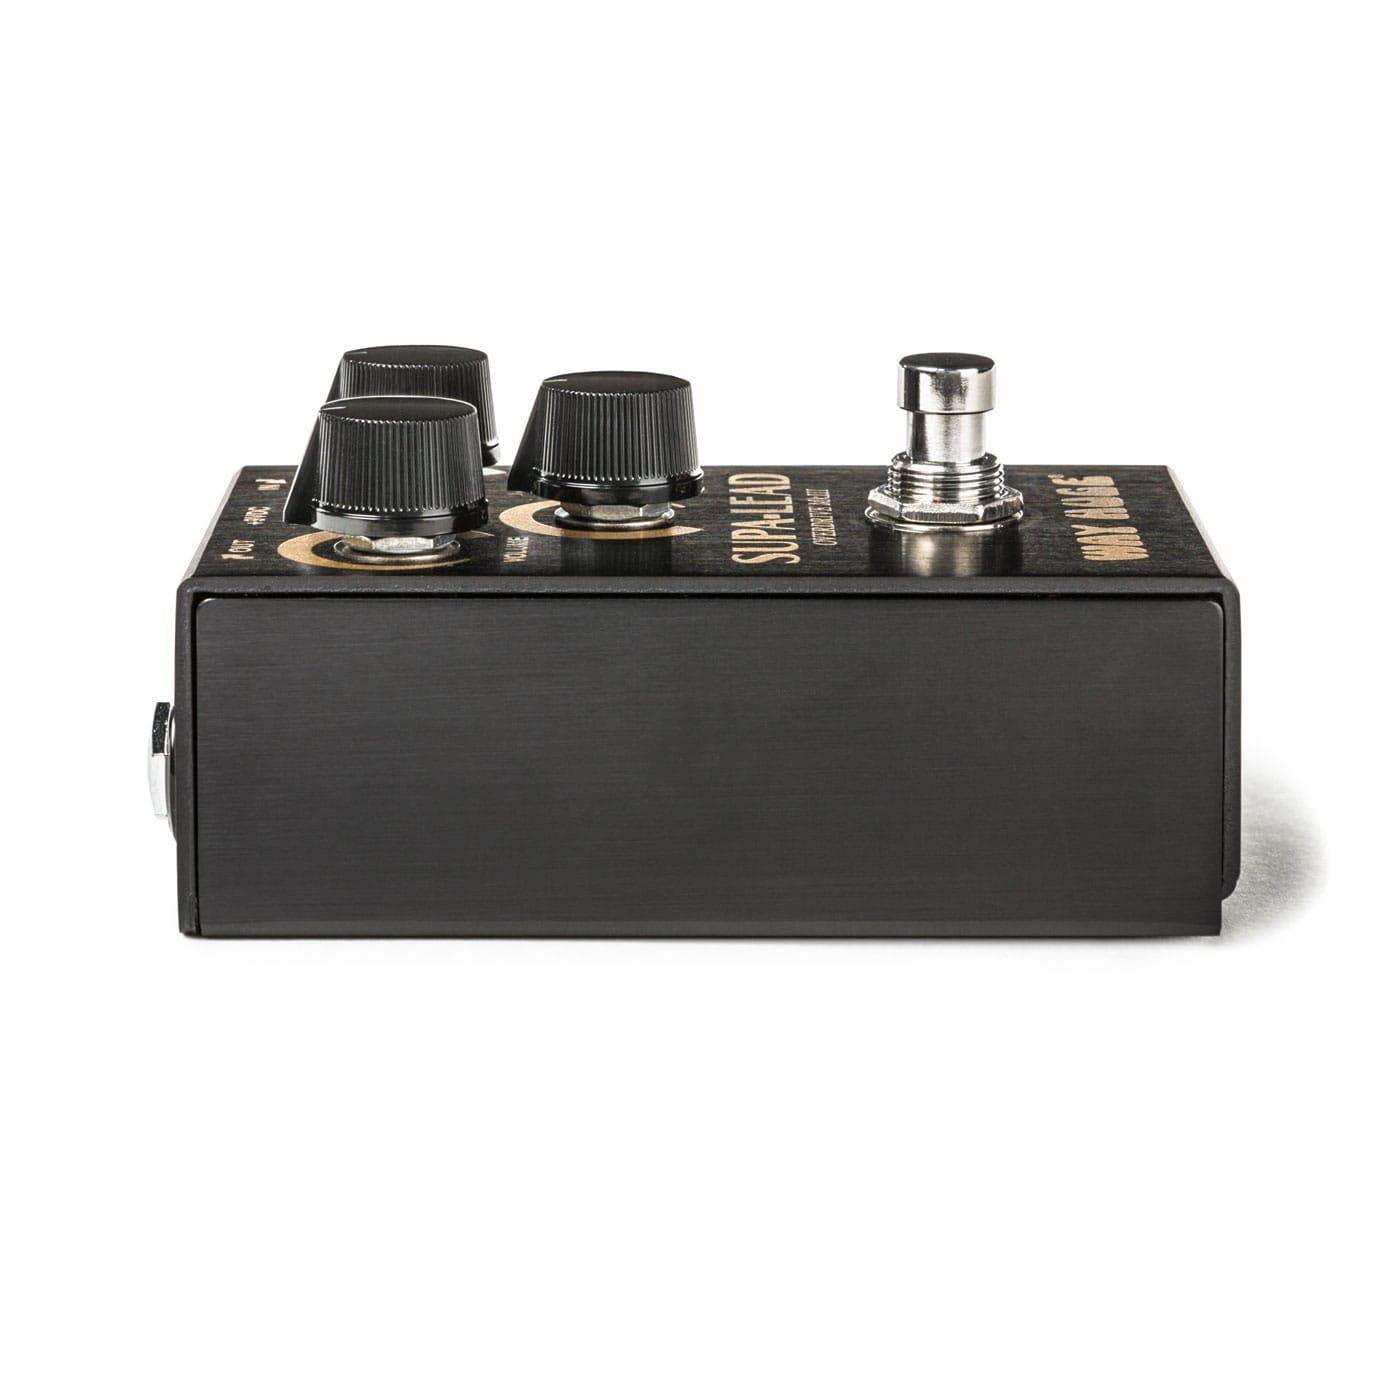 Way Huge Smalls WM31 Supa-Lead MkIII Overdrive pedal